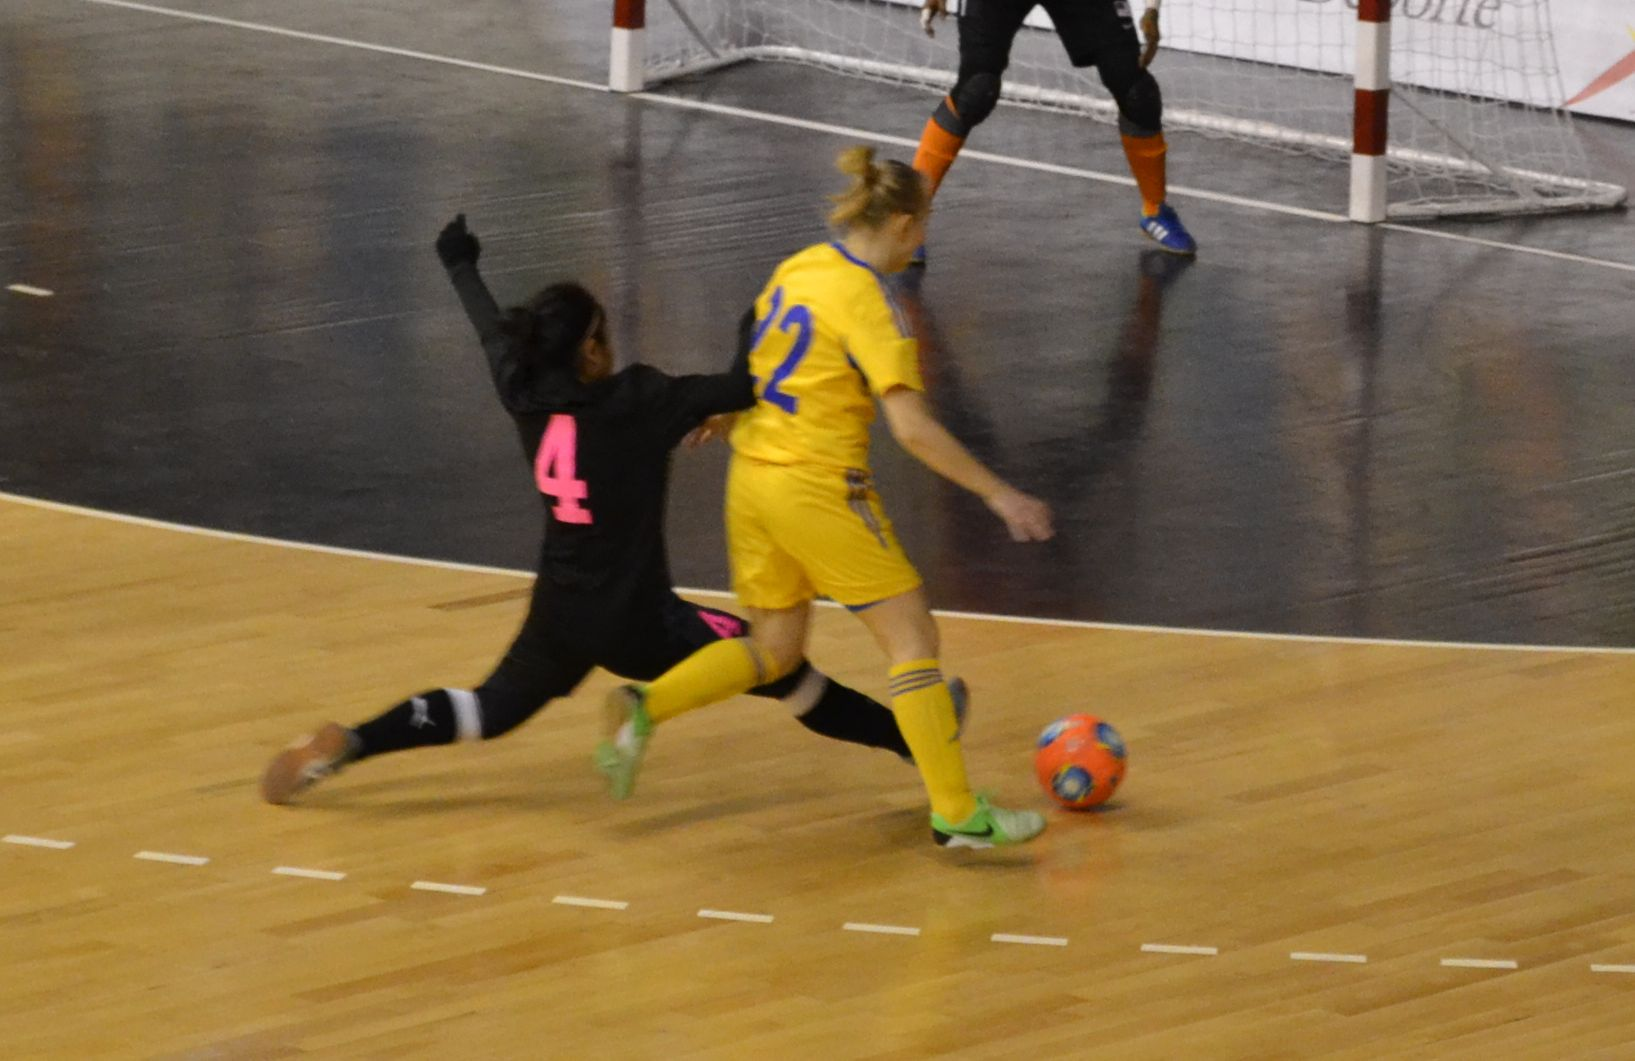 Alcázar de San Juan, футзал, женский футзал ЧМ, мини-футбол, Испания, Ciudad, IV Torneo Mundial de Fútbol Sala, FIFA world cup womens futsal